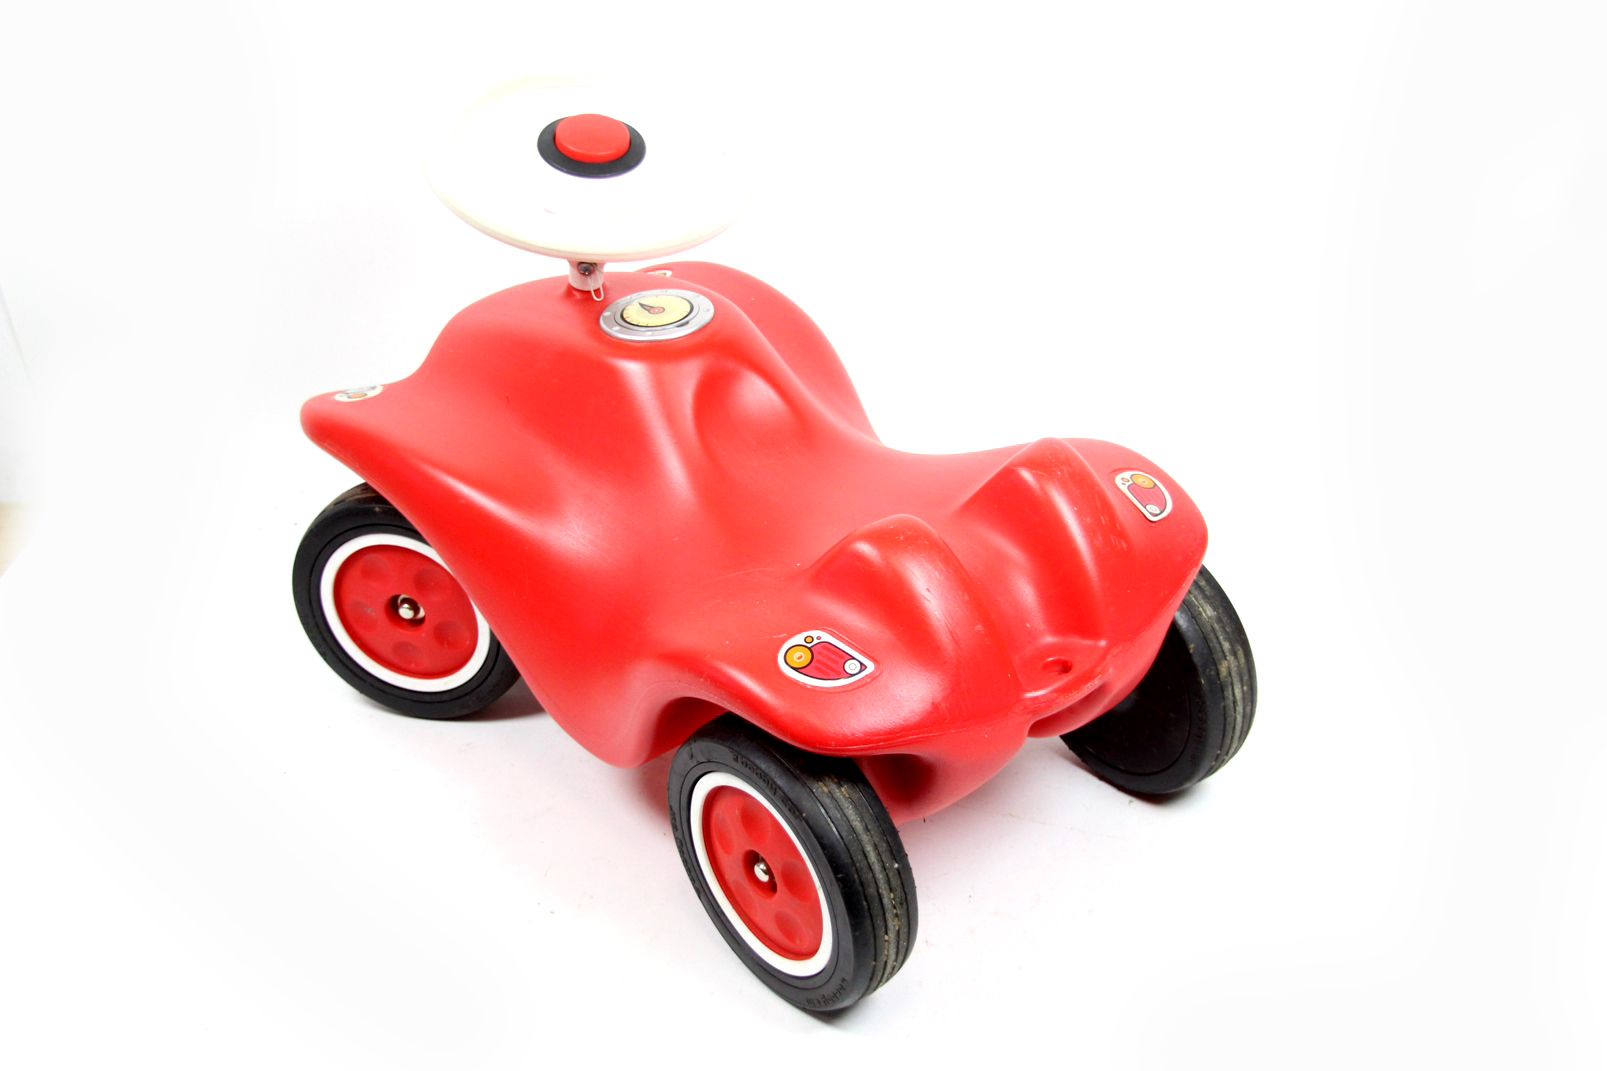 big bobby car kinderfahrzeug rot kinderrutscher kinderauto. Black Bedroom Furniture Sets. Home Design Ideas